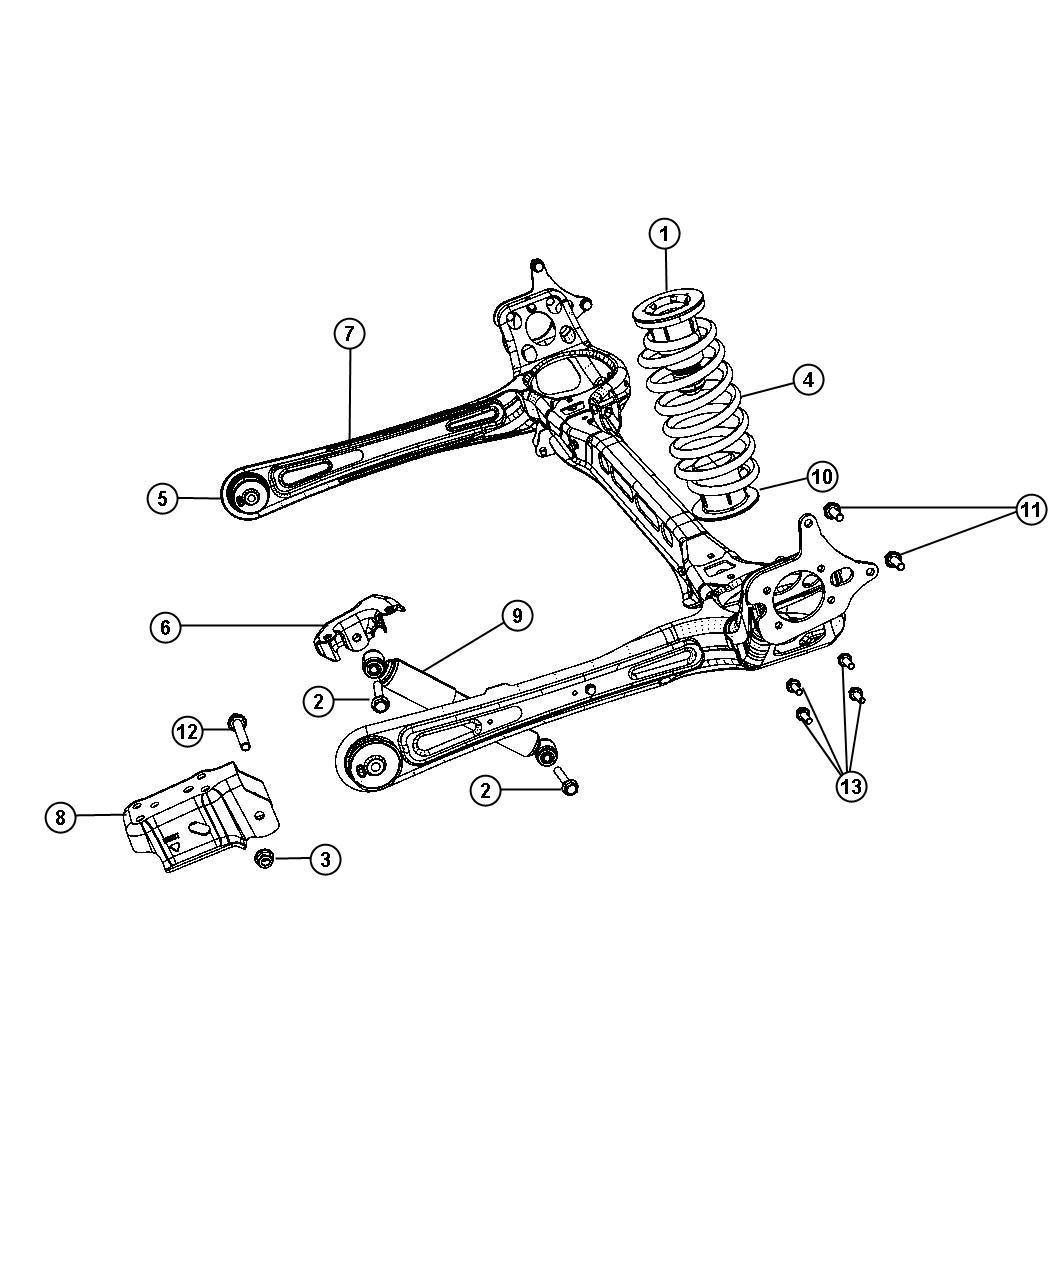 2011 Chrysler Town & Country Shock absorber kit